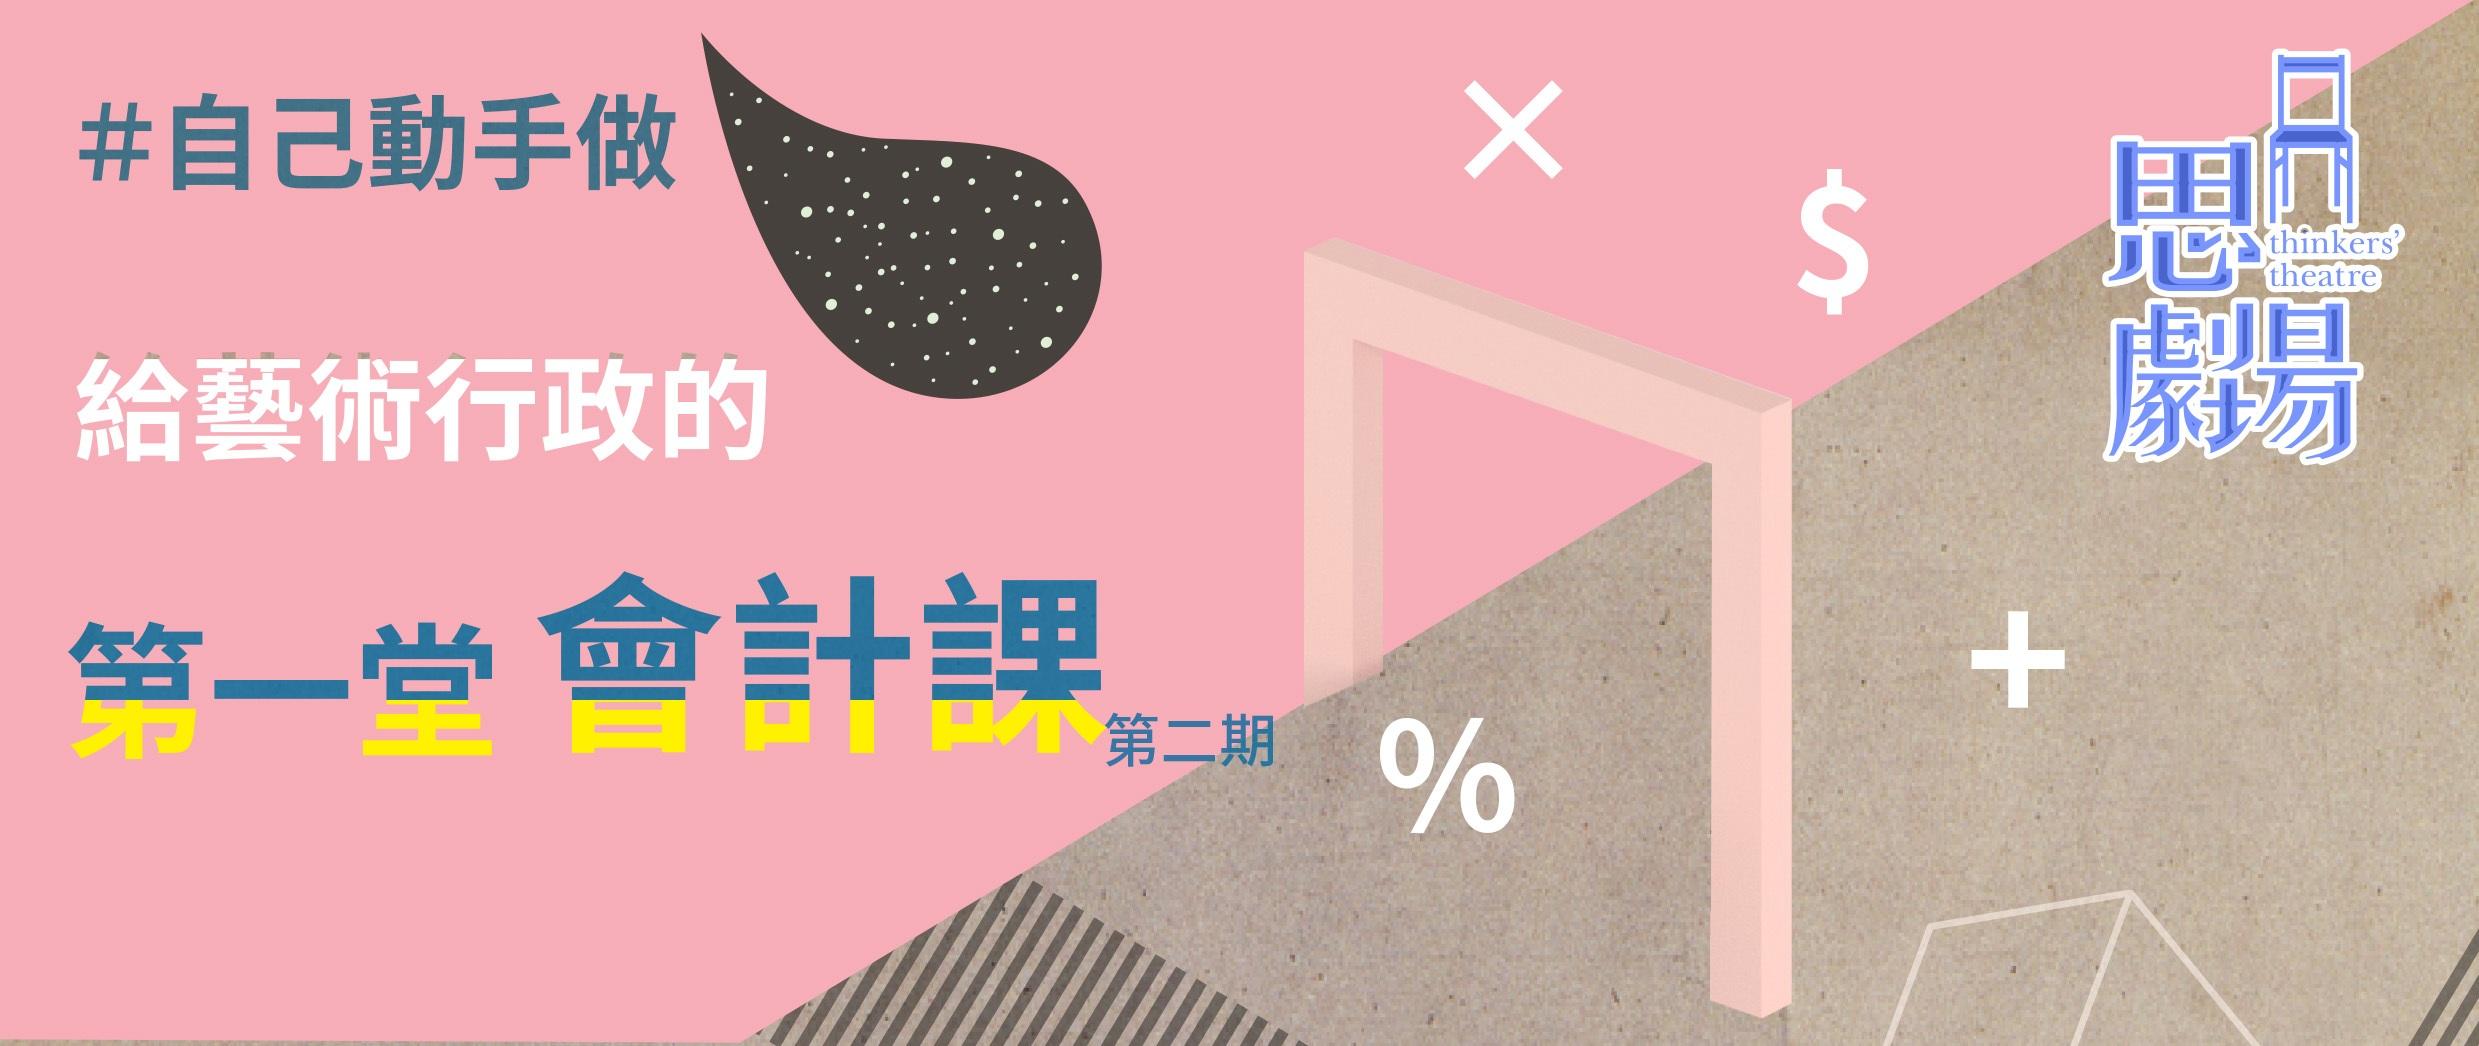 %E7%B5%A6%E8%97%9D%E8%A1%93%E8%A1%8C%E6%94%BF%E7%9A%84%E7%AC%AC%E4%B8%80%E5%A0%82%E8%AA%B2%E4%B9%8B%E4%BA%8C.jpg